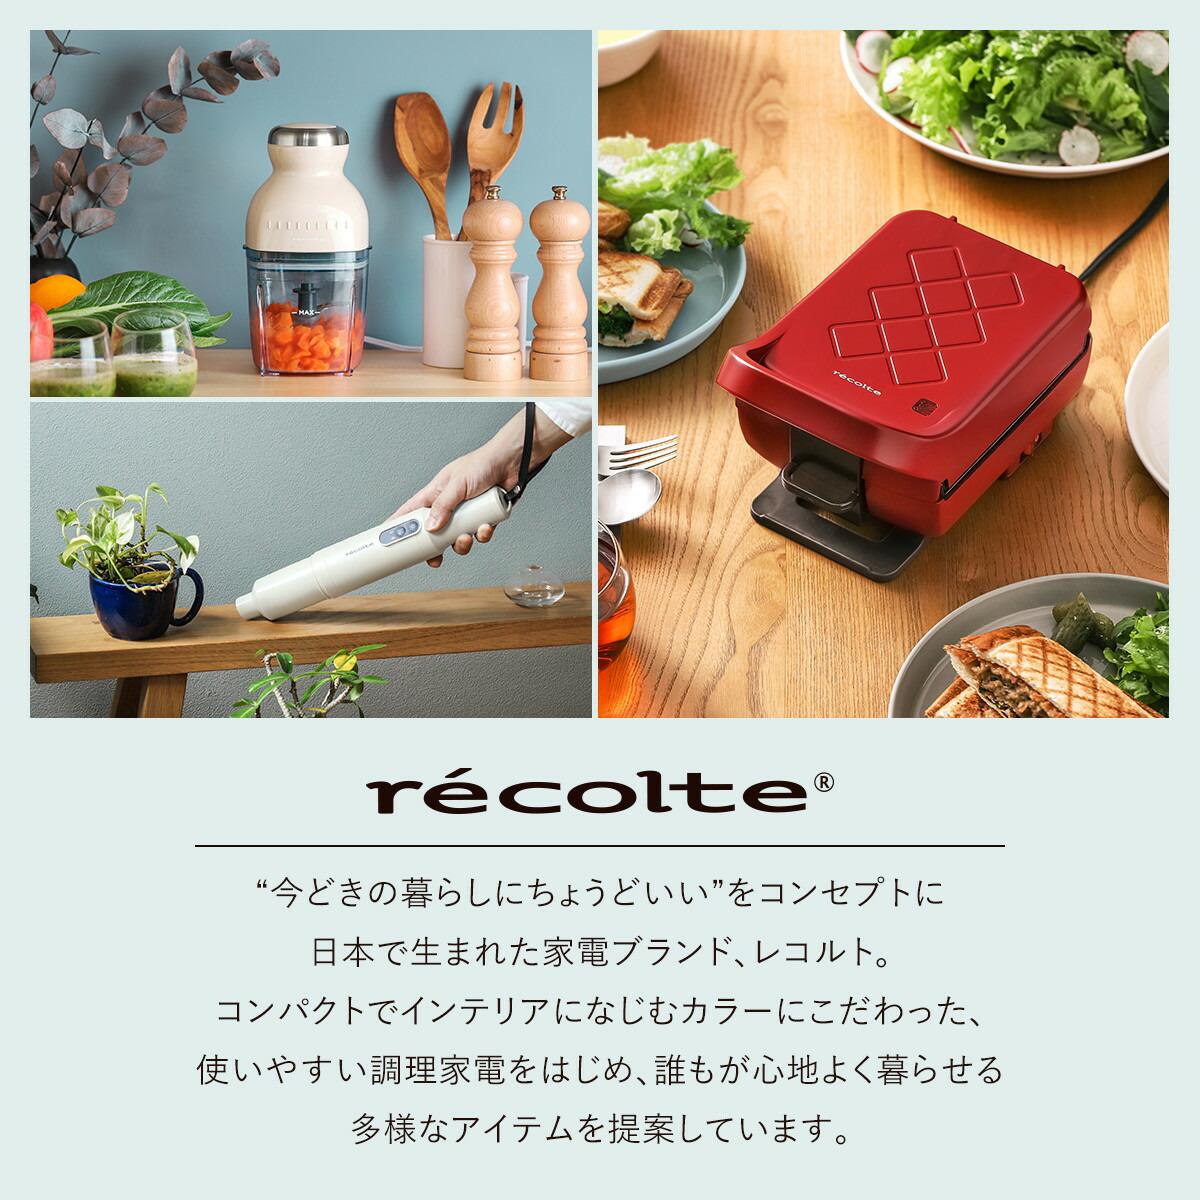 recolte(レコルト)特集